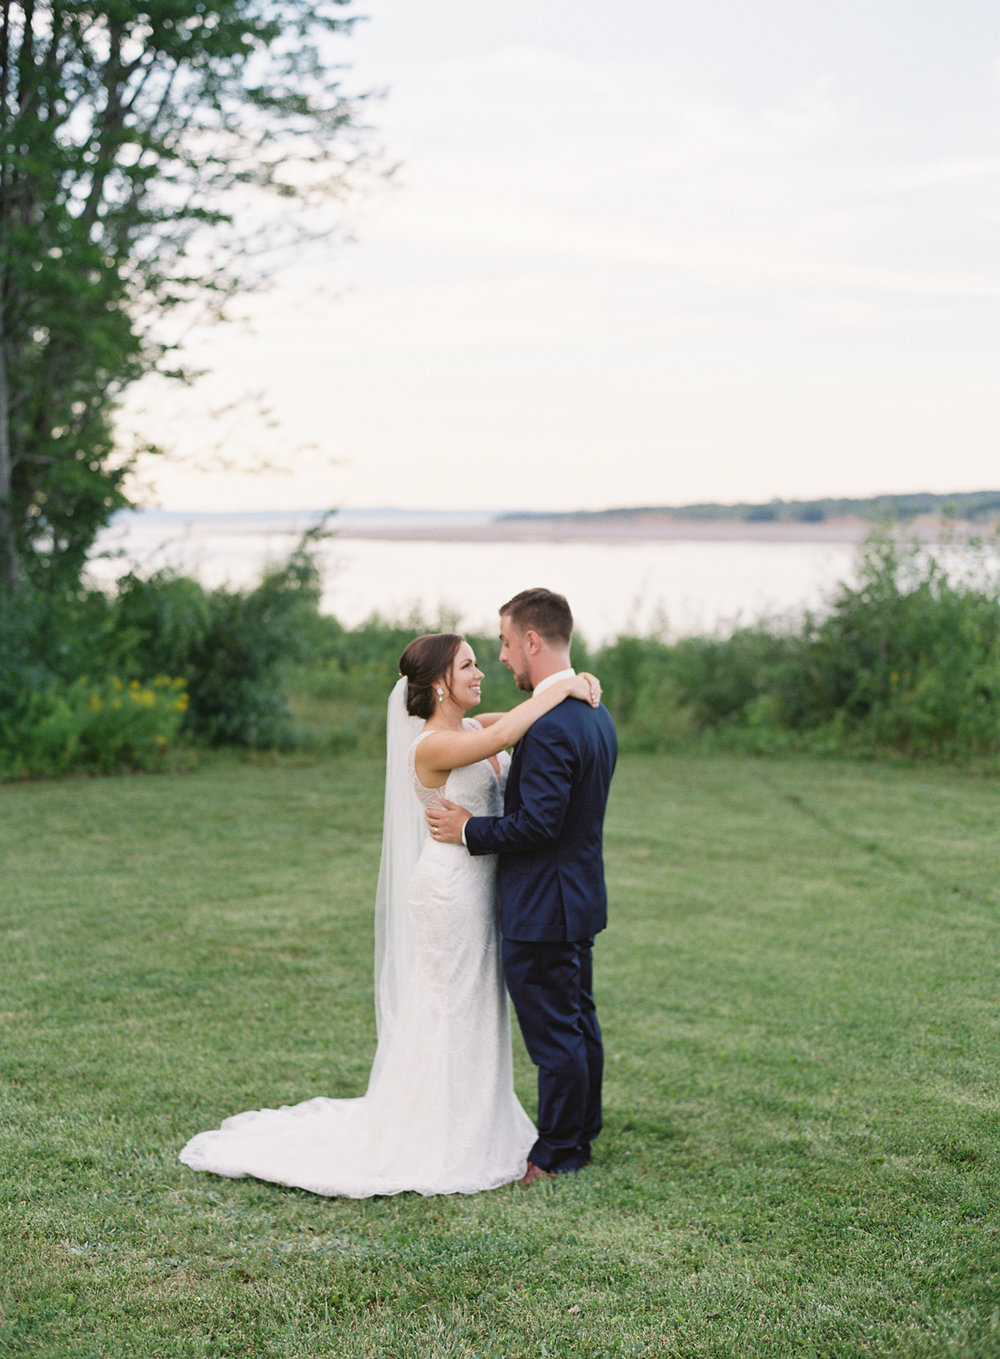 Jacqueline Anne Photography - Nova Scotia Backyard Wedding-88.jpg